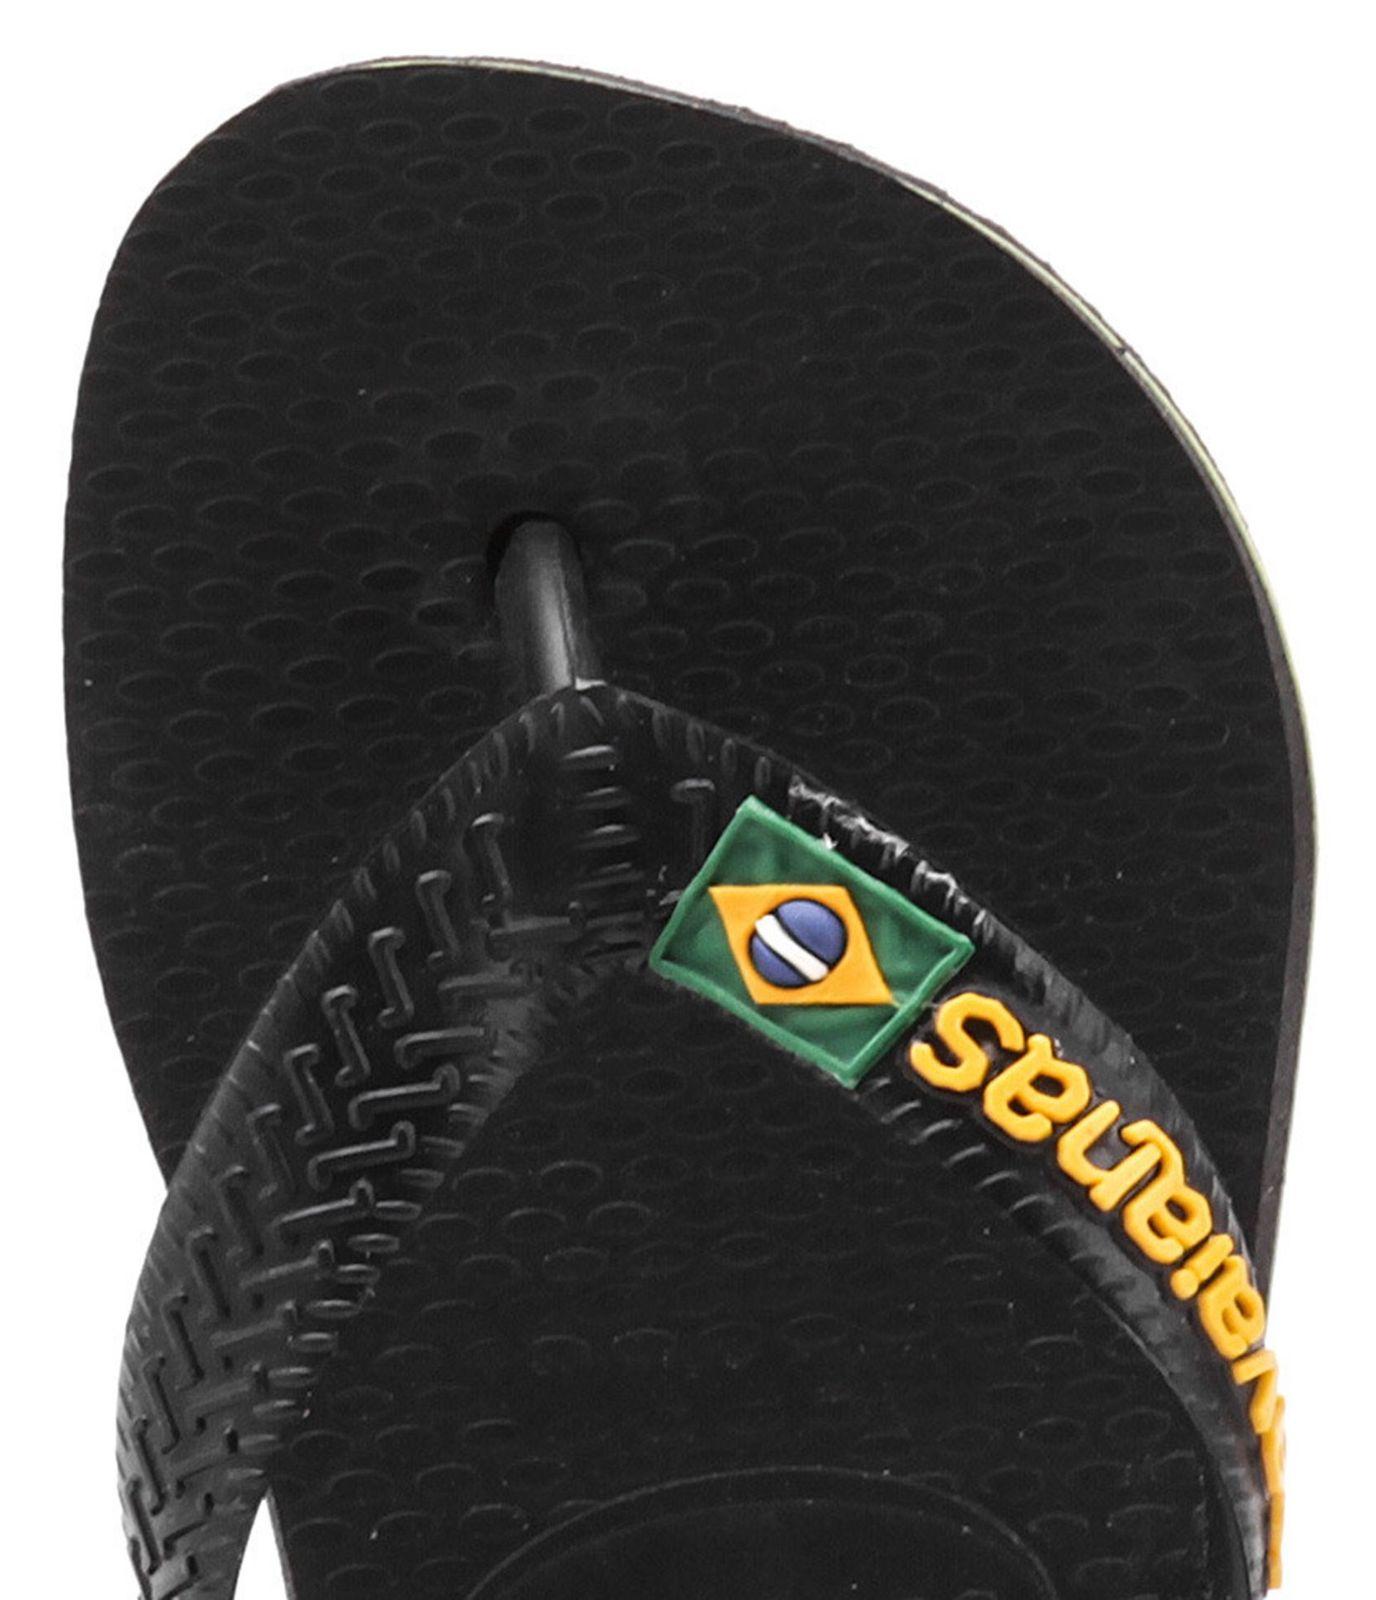 دمپایی لا انگشتی بزرگسال Brasil - هاواینس main 1 5